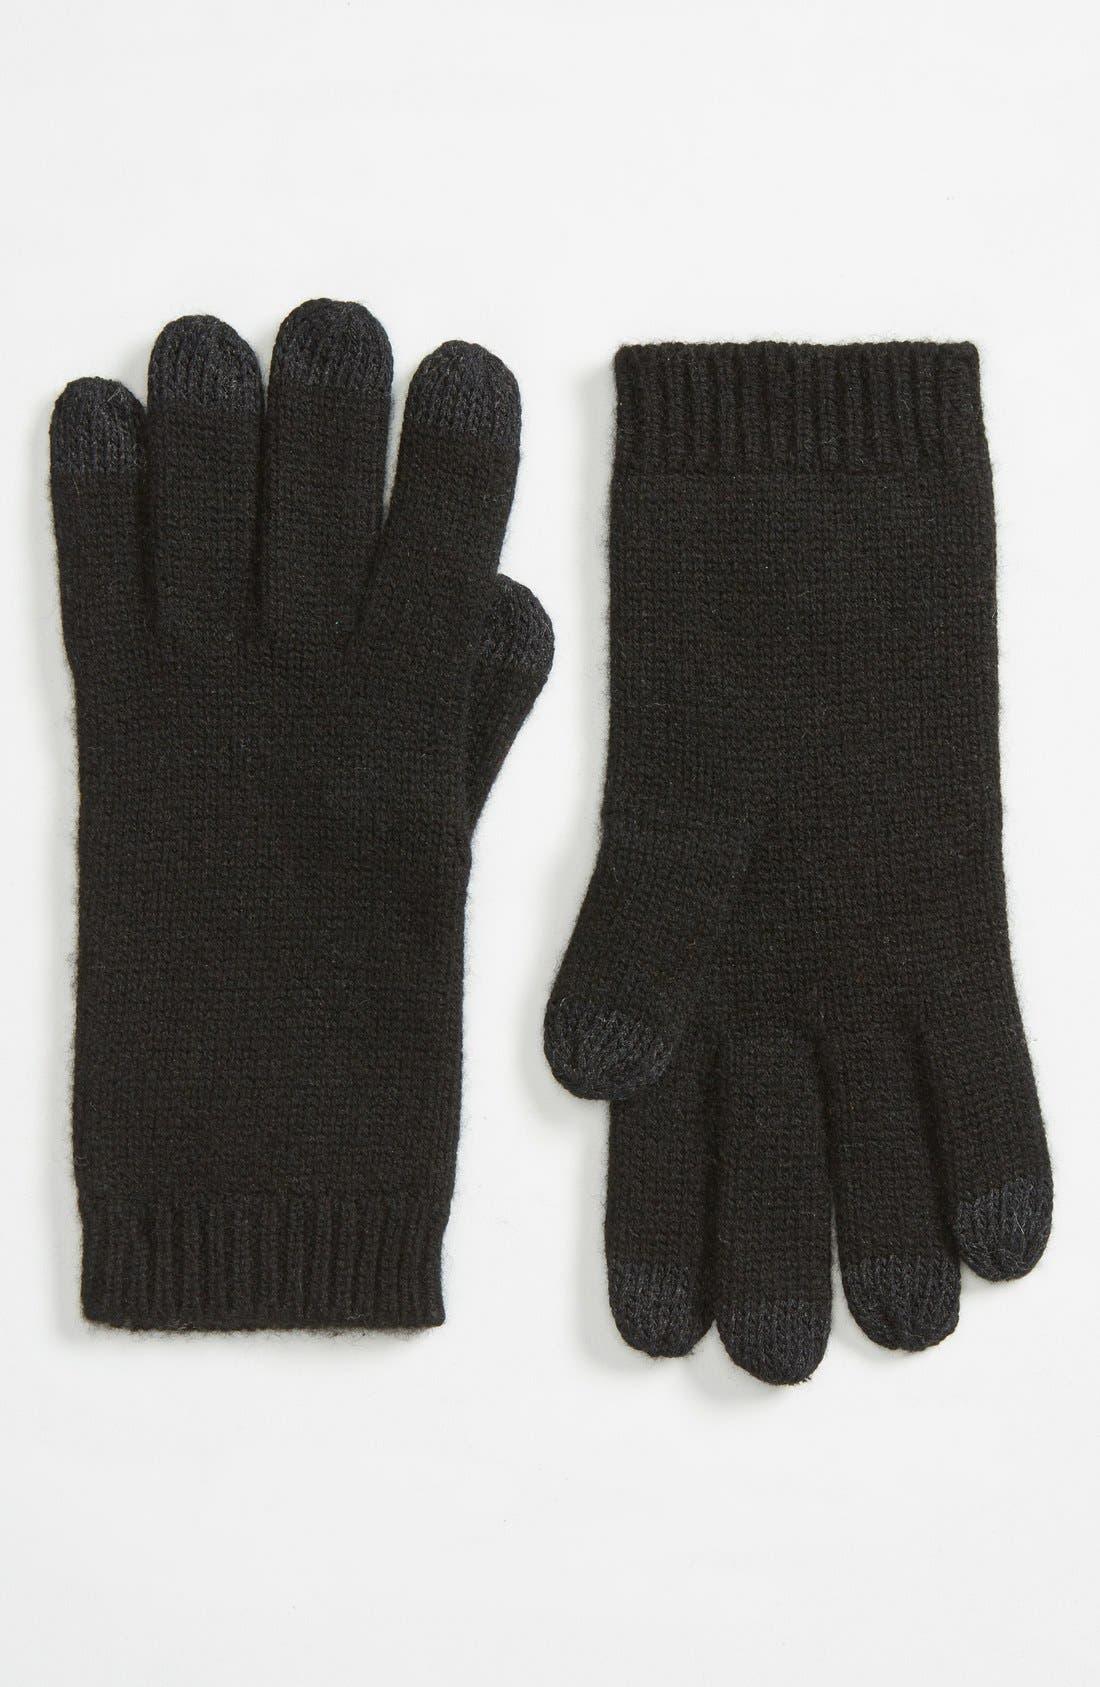 'Luxe Smart' Tech Gloves,                             Main thumbnail 1, color,                             001